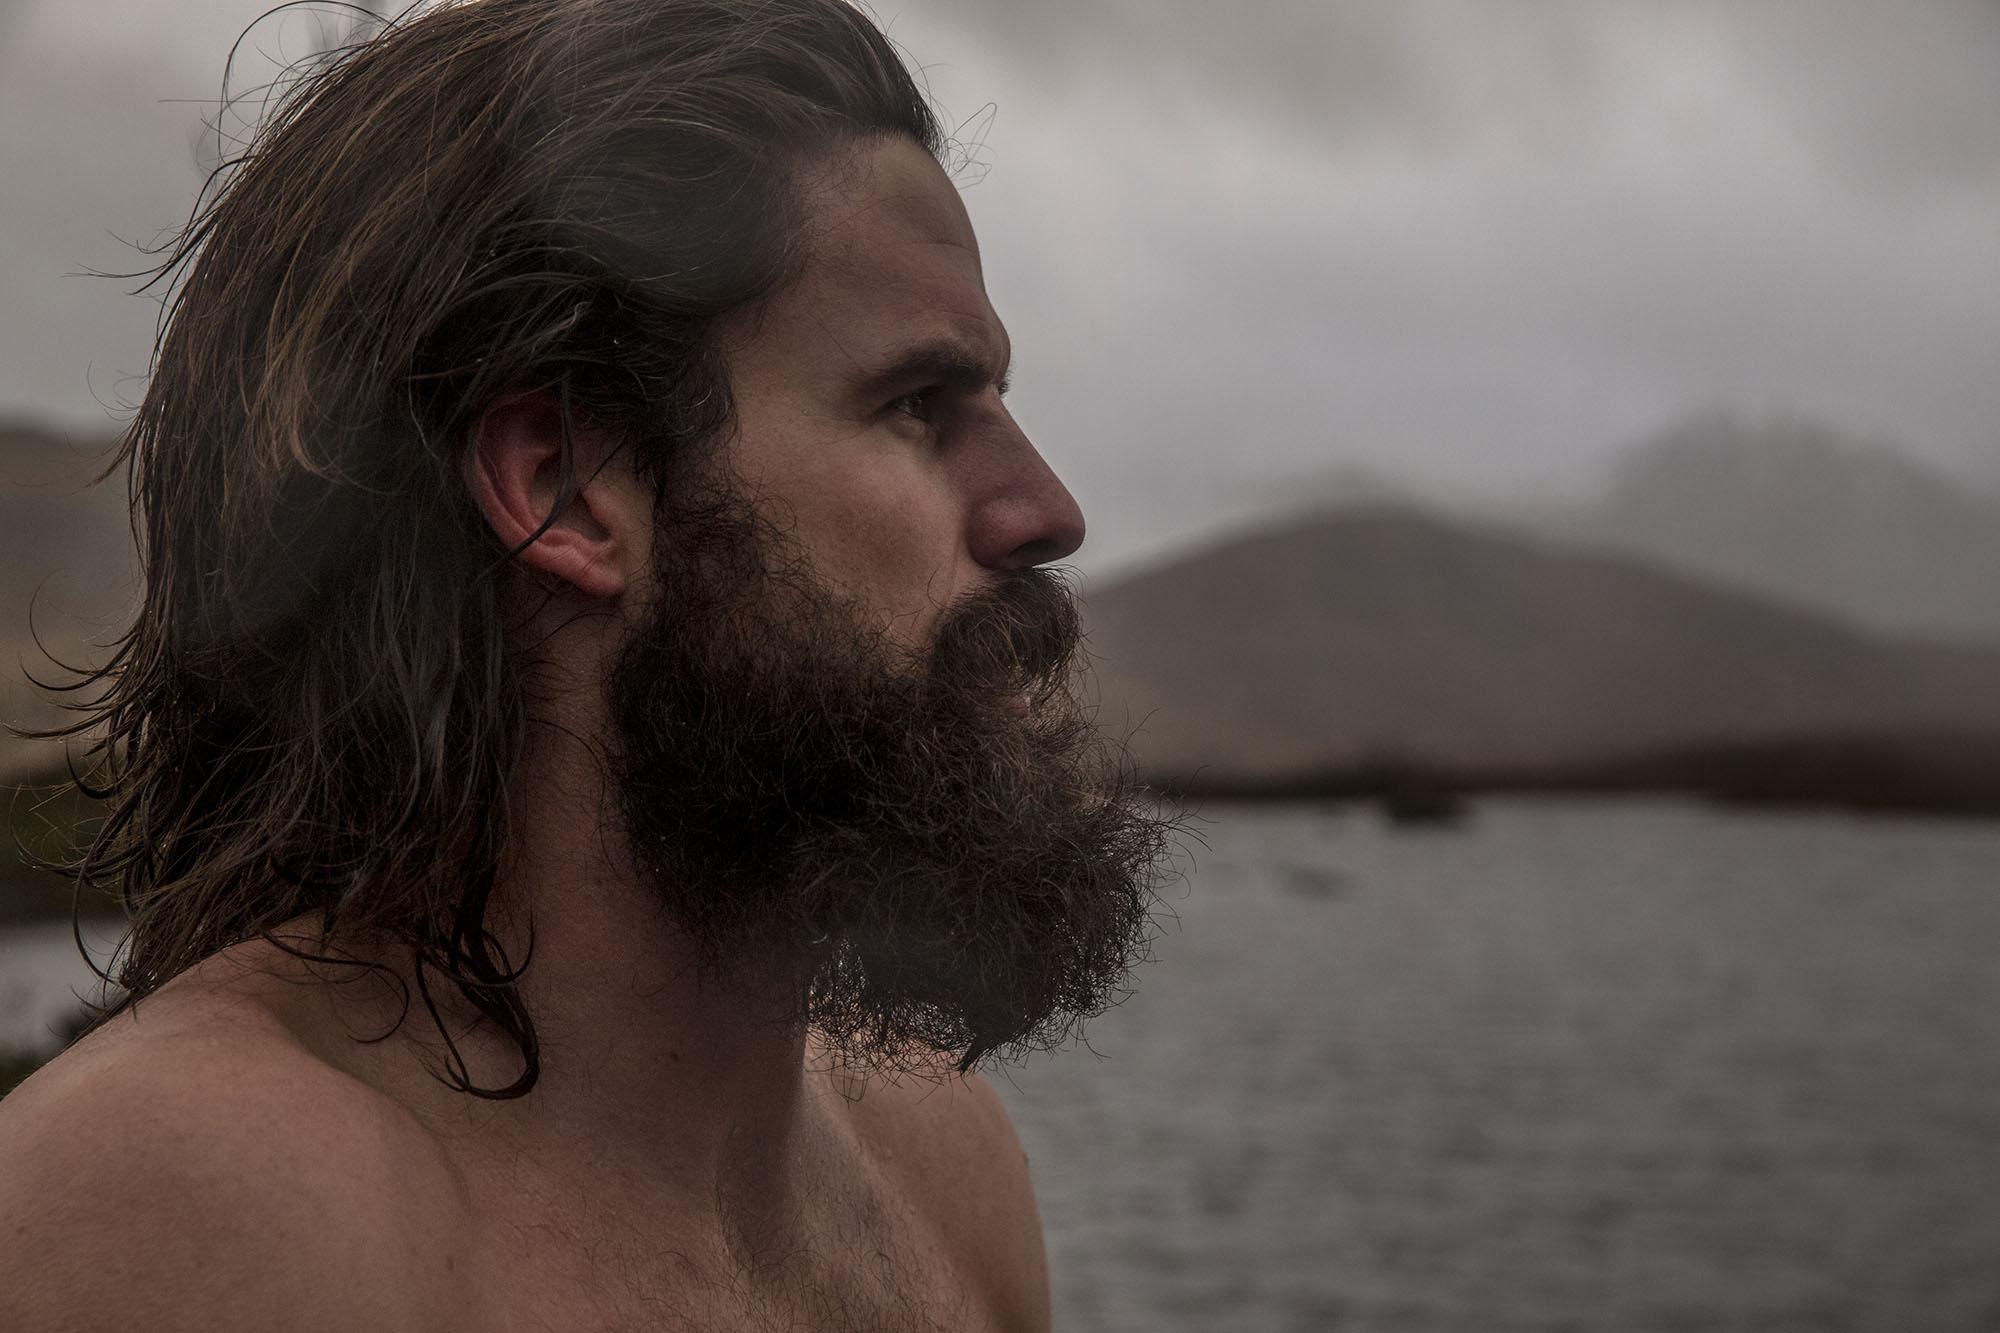 Richard Wadey - bearded man